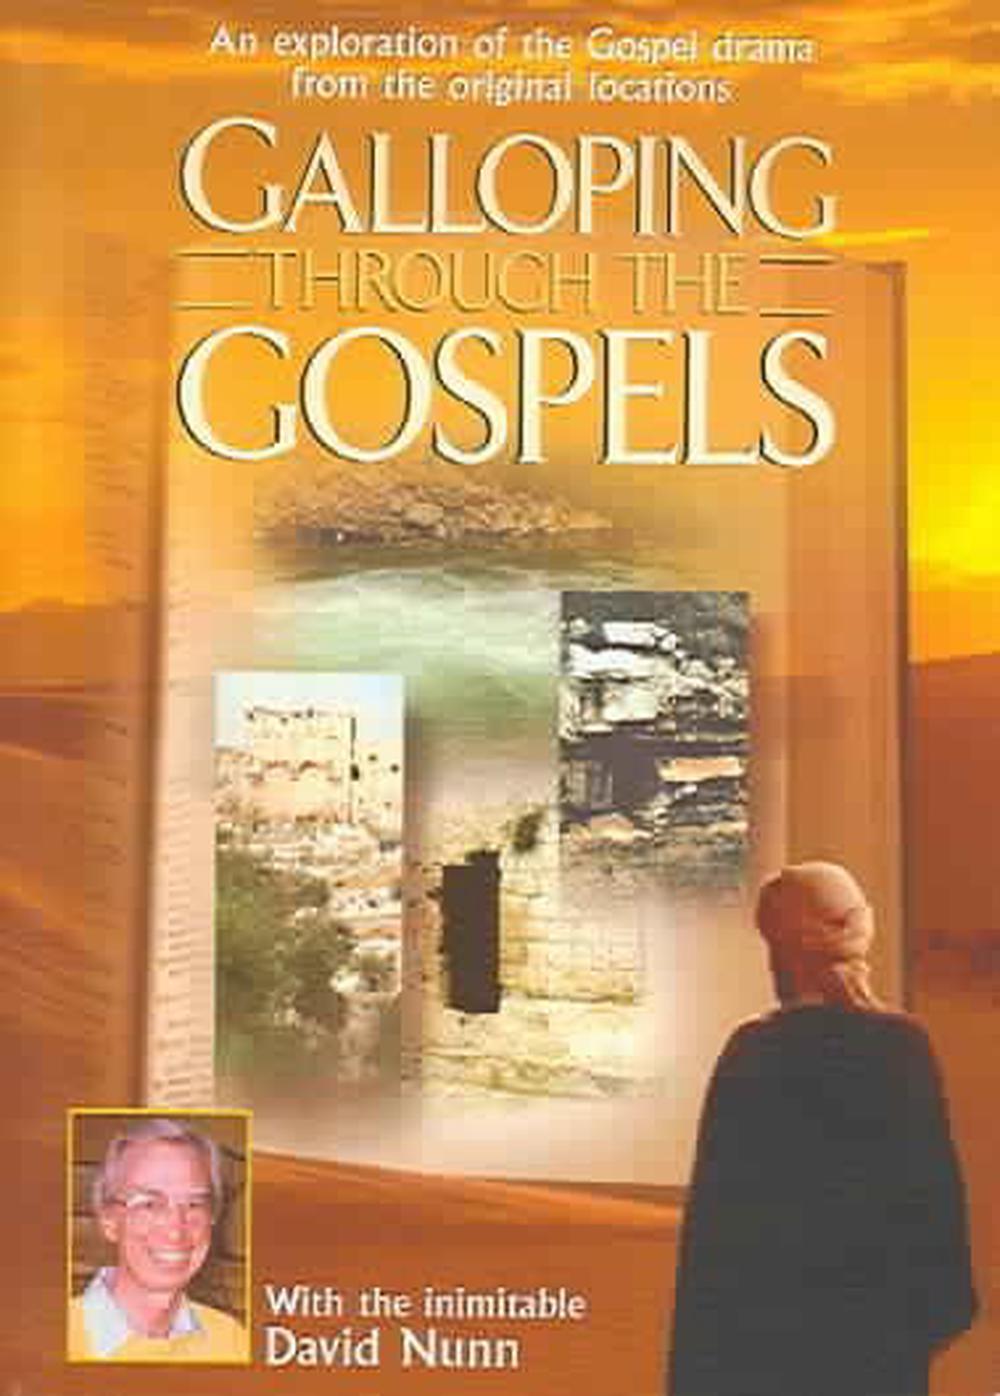 Galloping Through The Gospels DVD